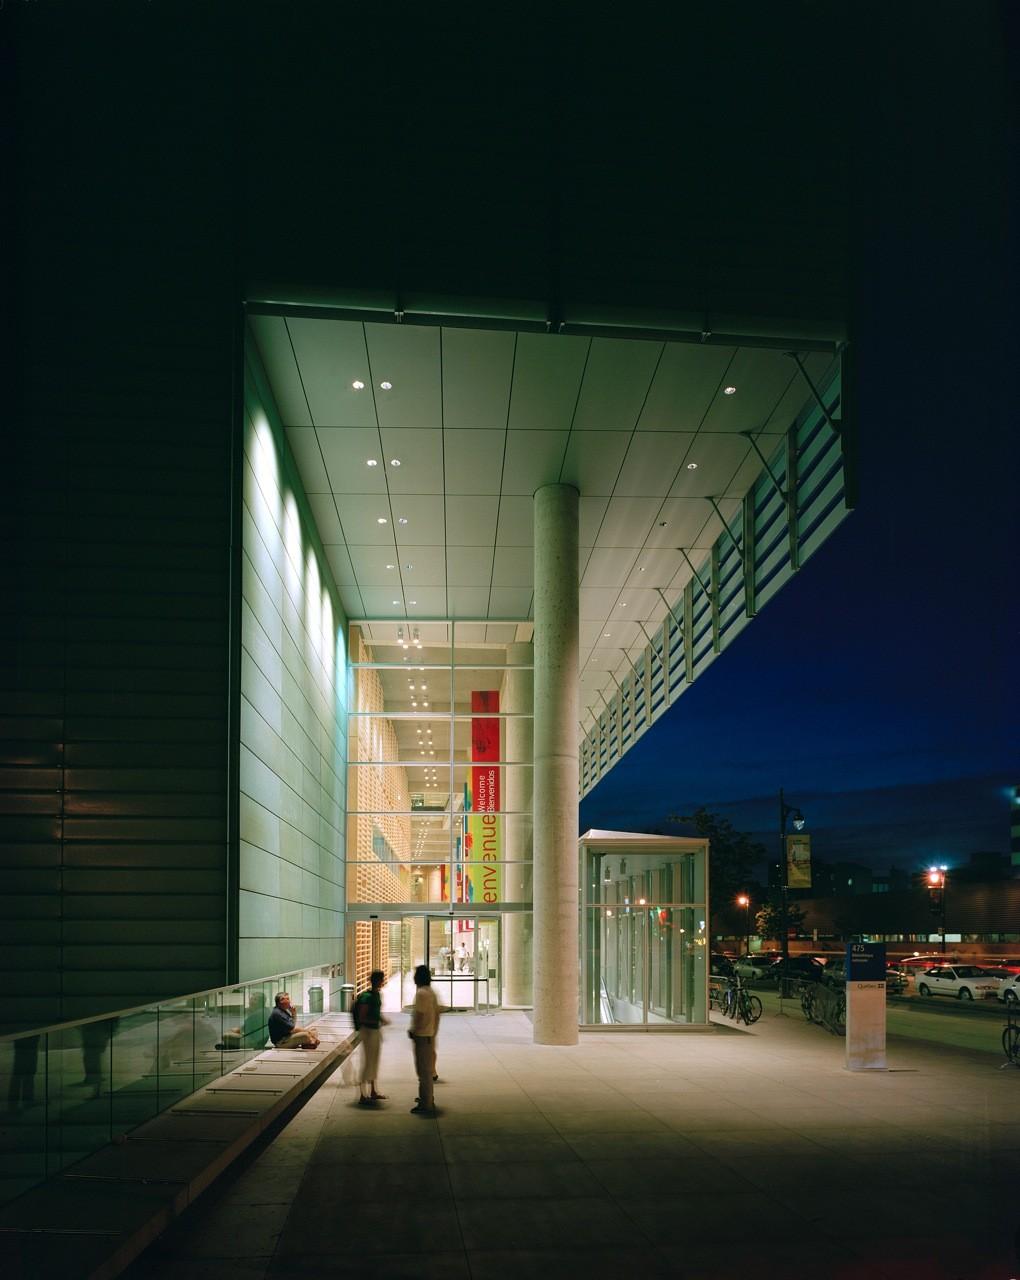 Grand Library of Québec / Patkau Architects  + Croft Pelletier + Menkès Shooner Dagenais architectes associés, © Bernard Fougeres